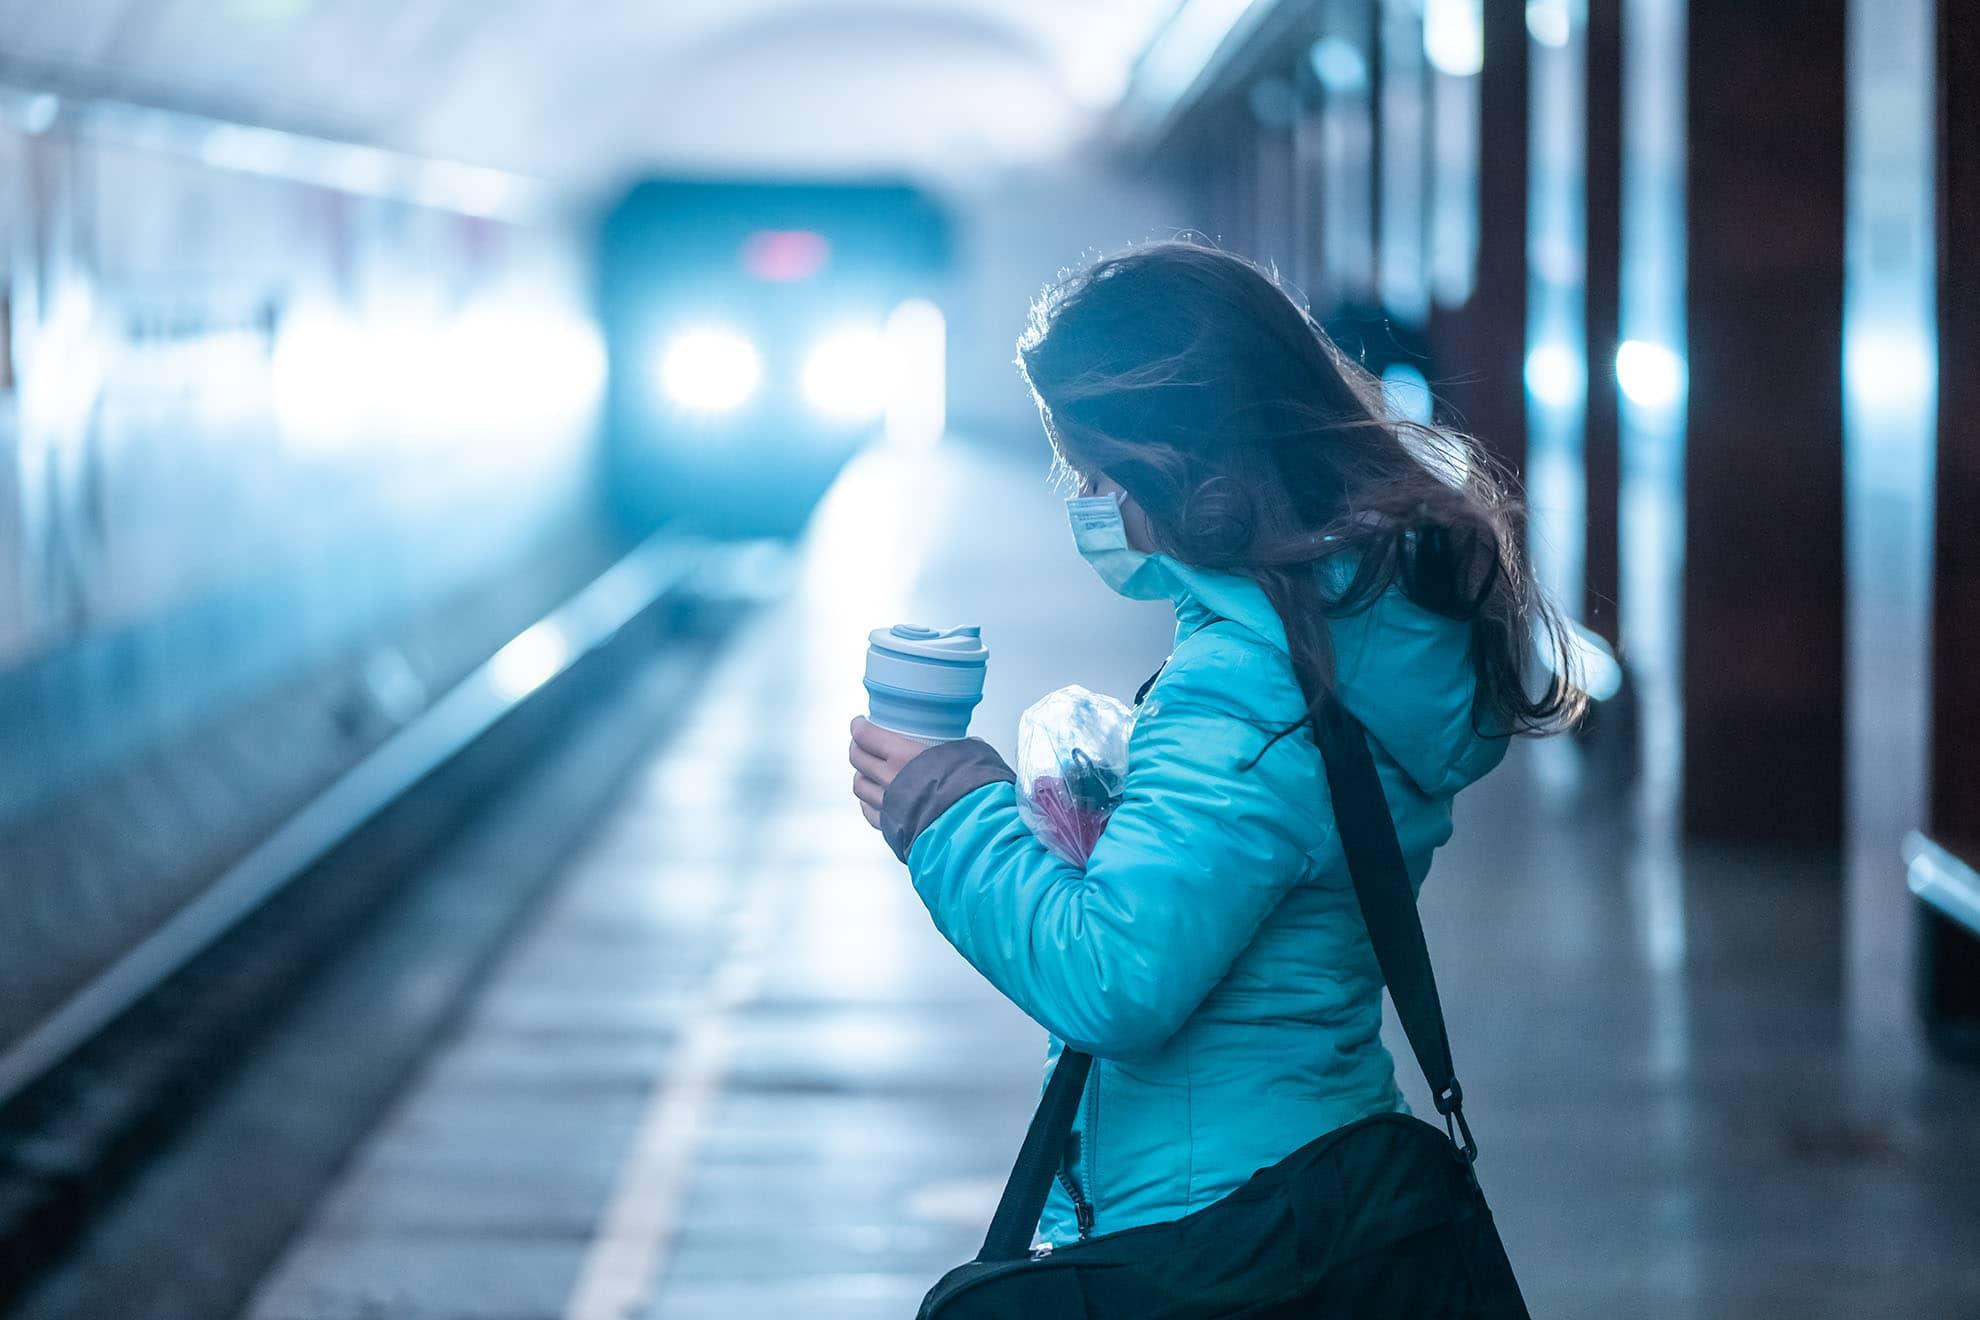 woman-wait-at-a-subway-station-in-kiev-S2TPUJP-min